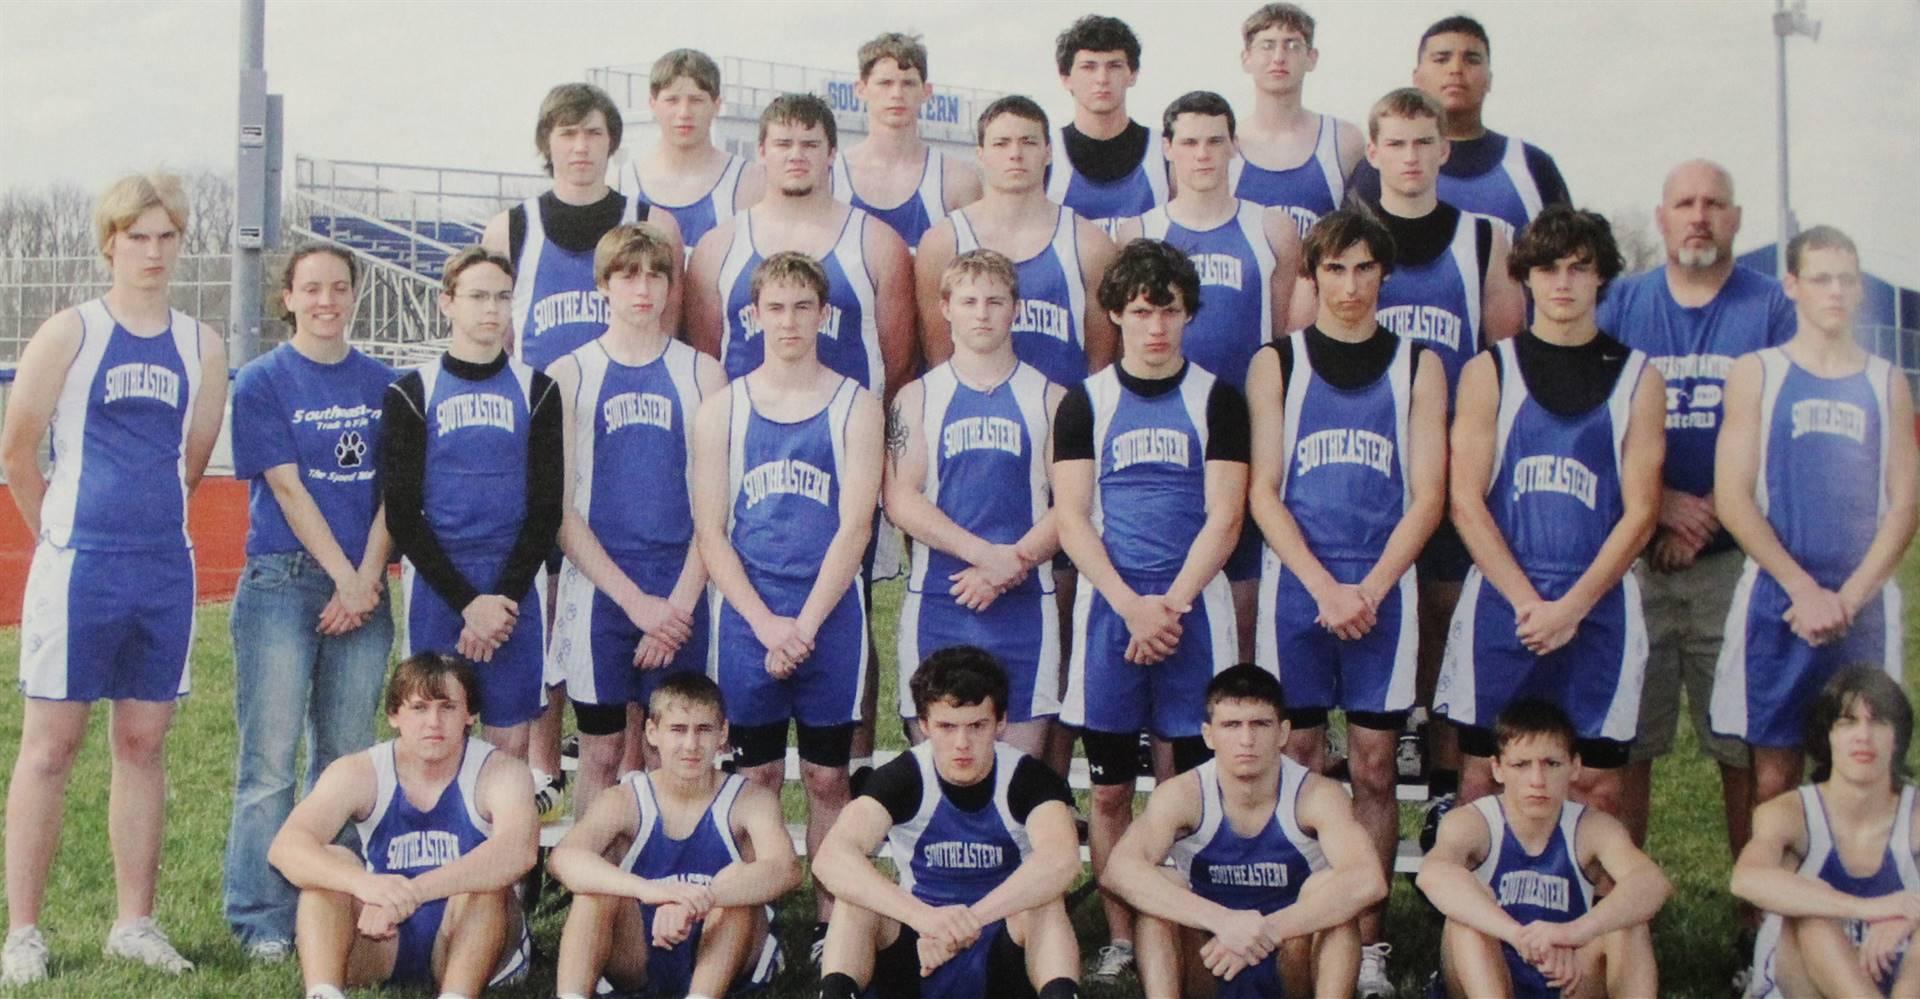 2009 Boys track